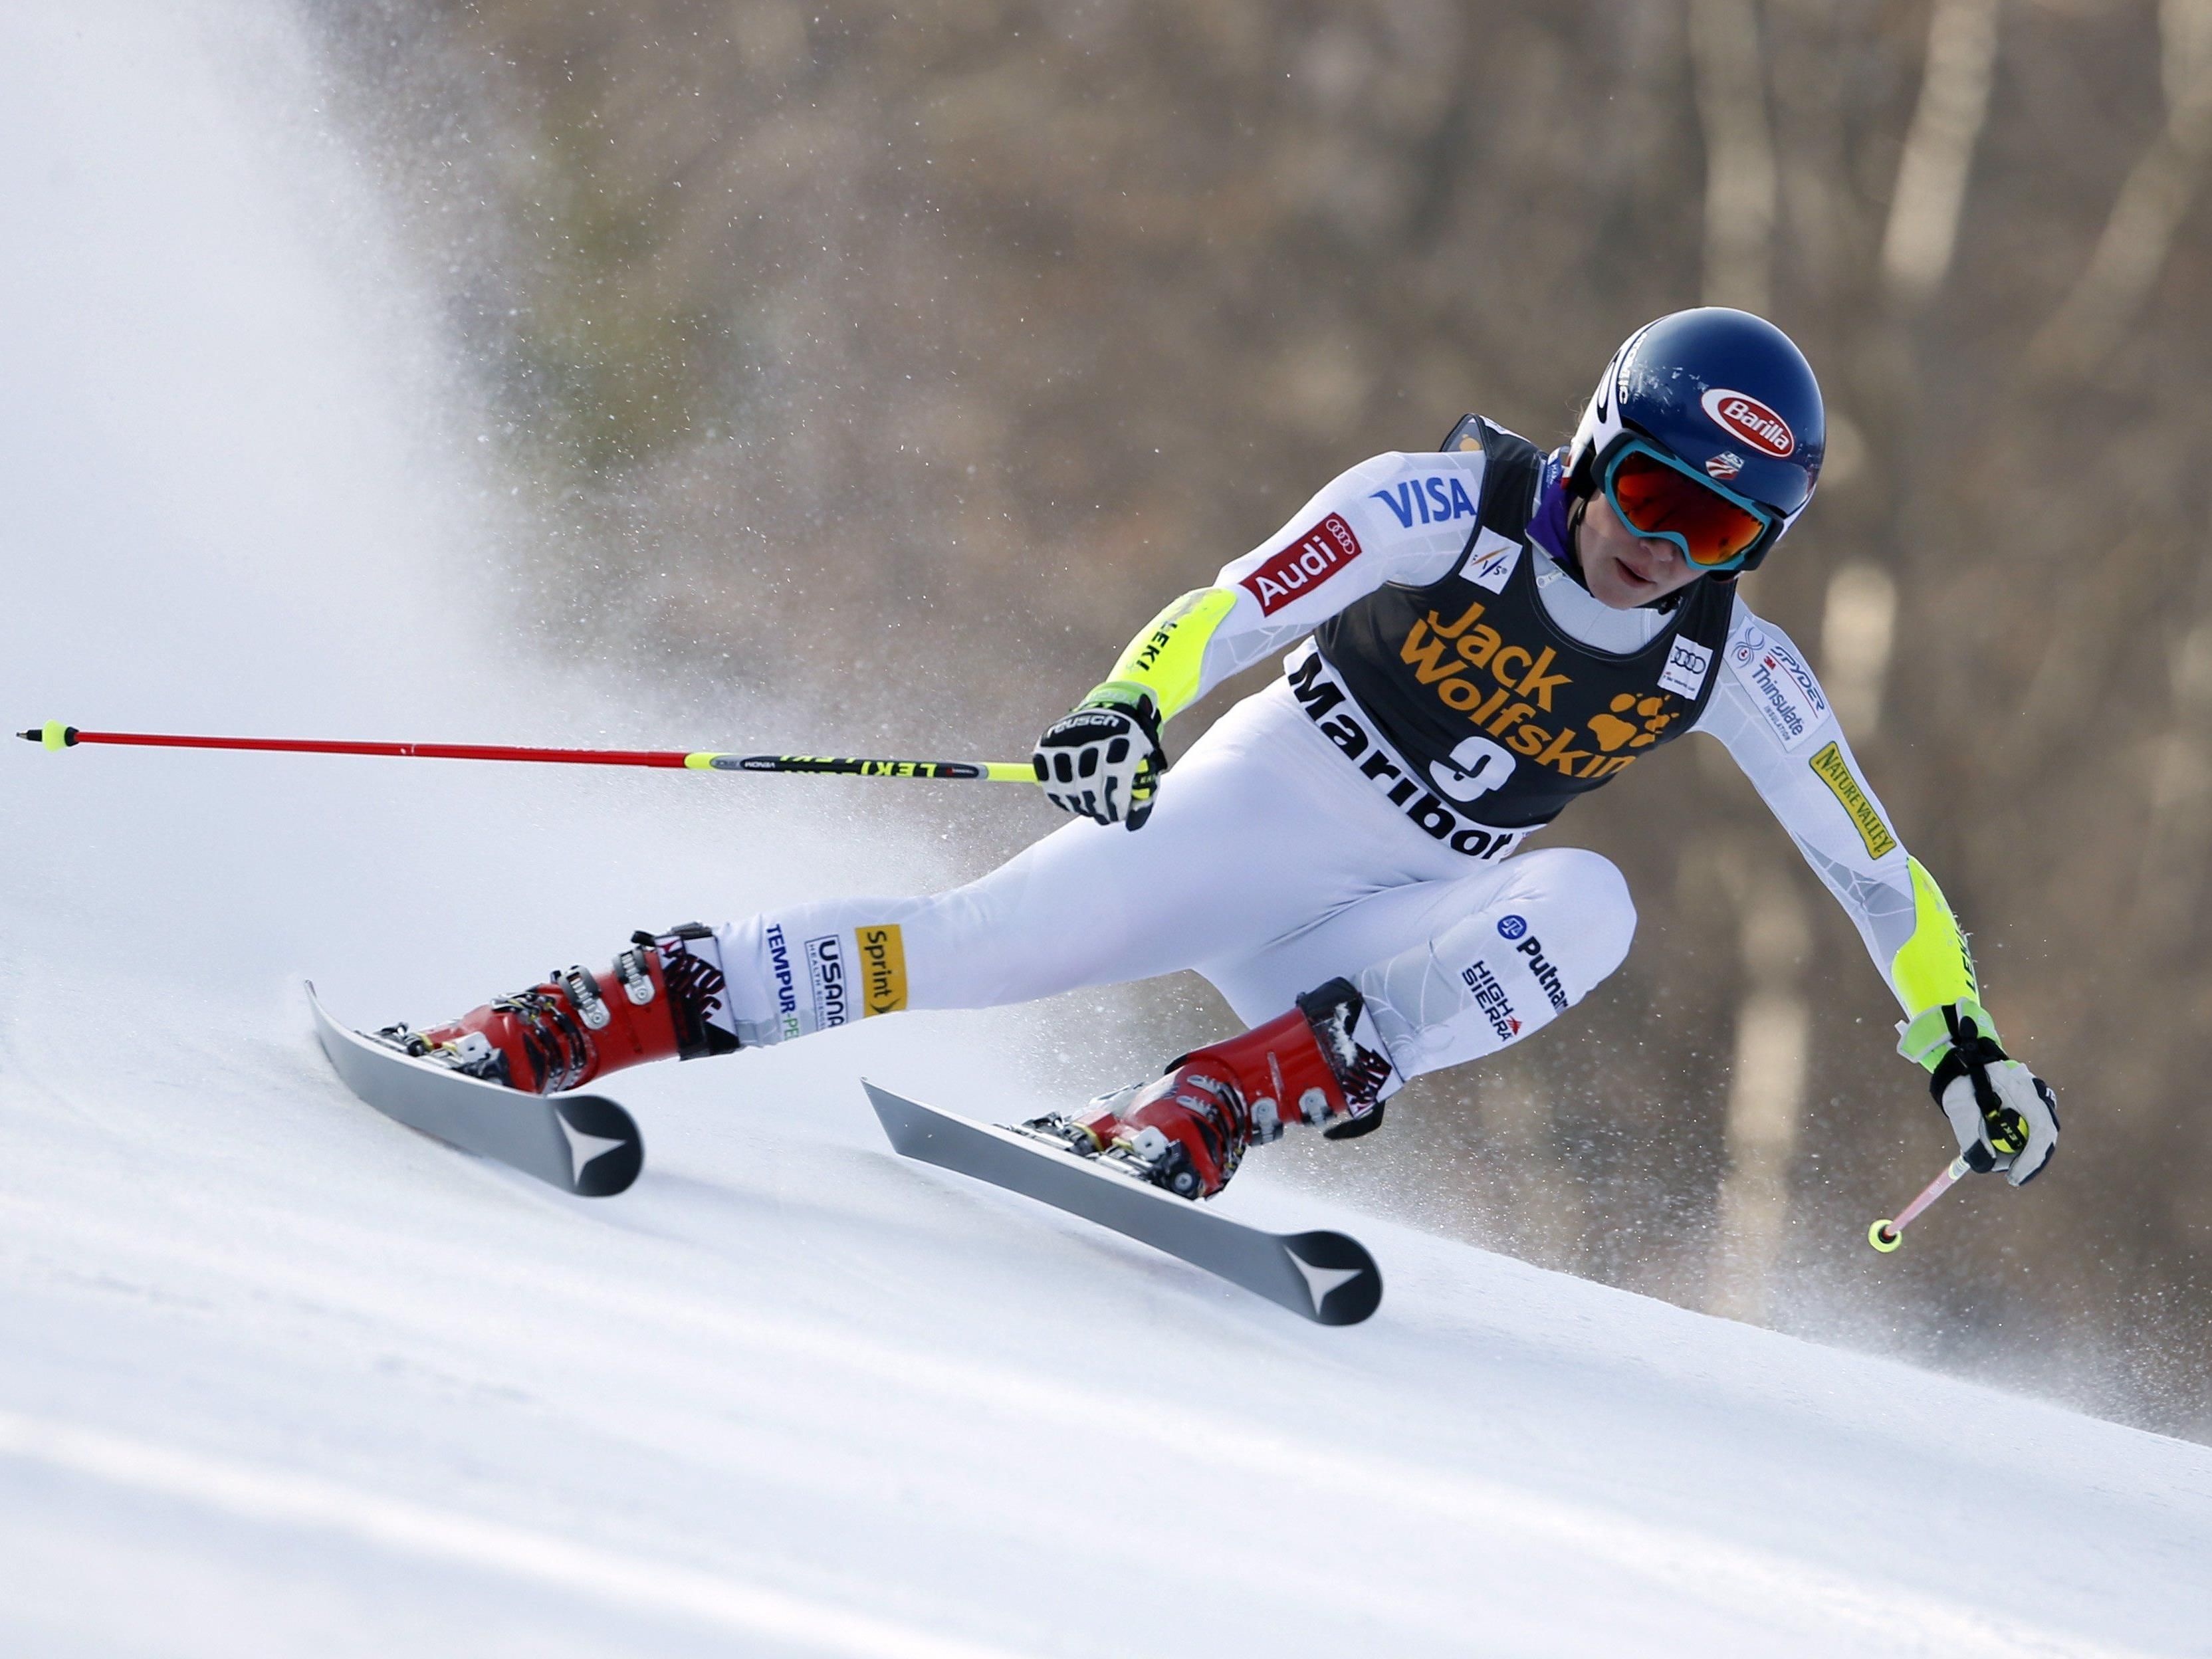 Damen-Slalom in Maribor: Shiffrin übernimmt Führung